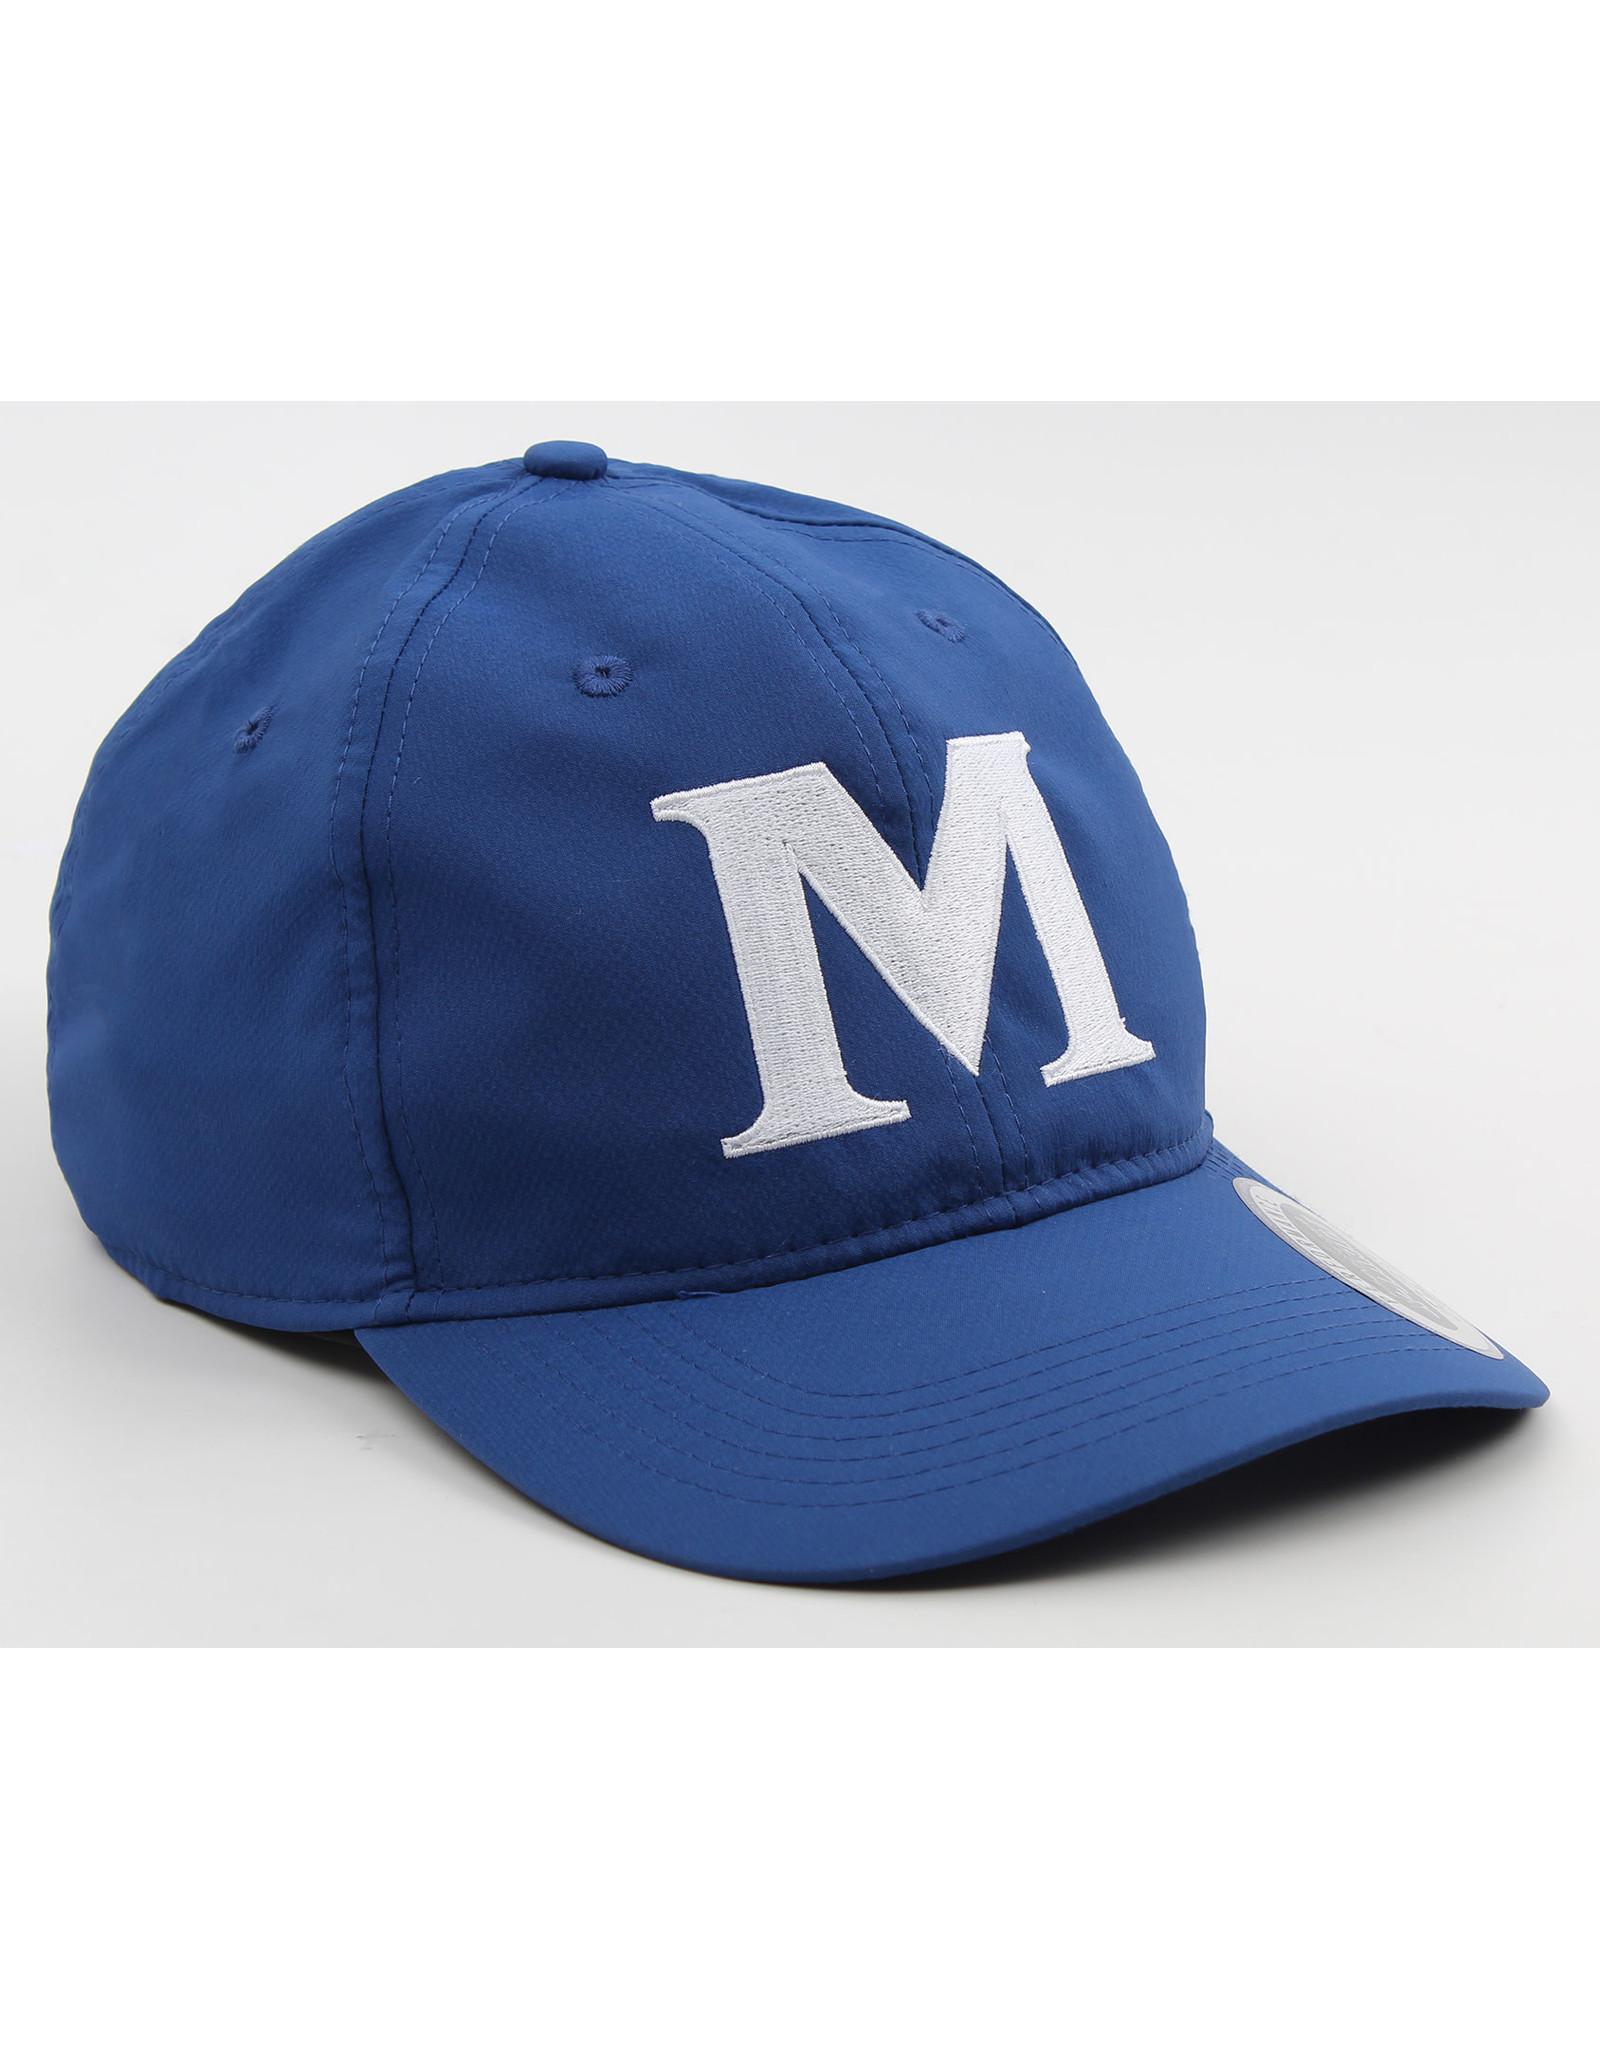 ROYAL VENT TECH CAP -XL